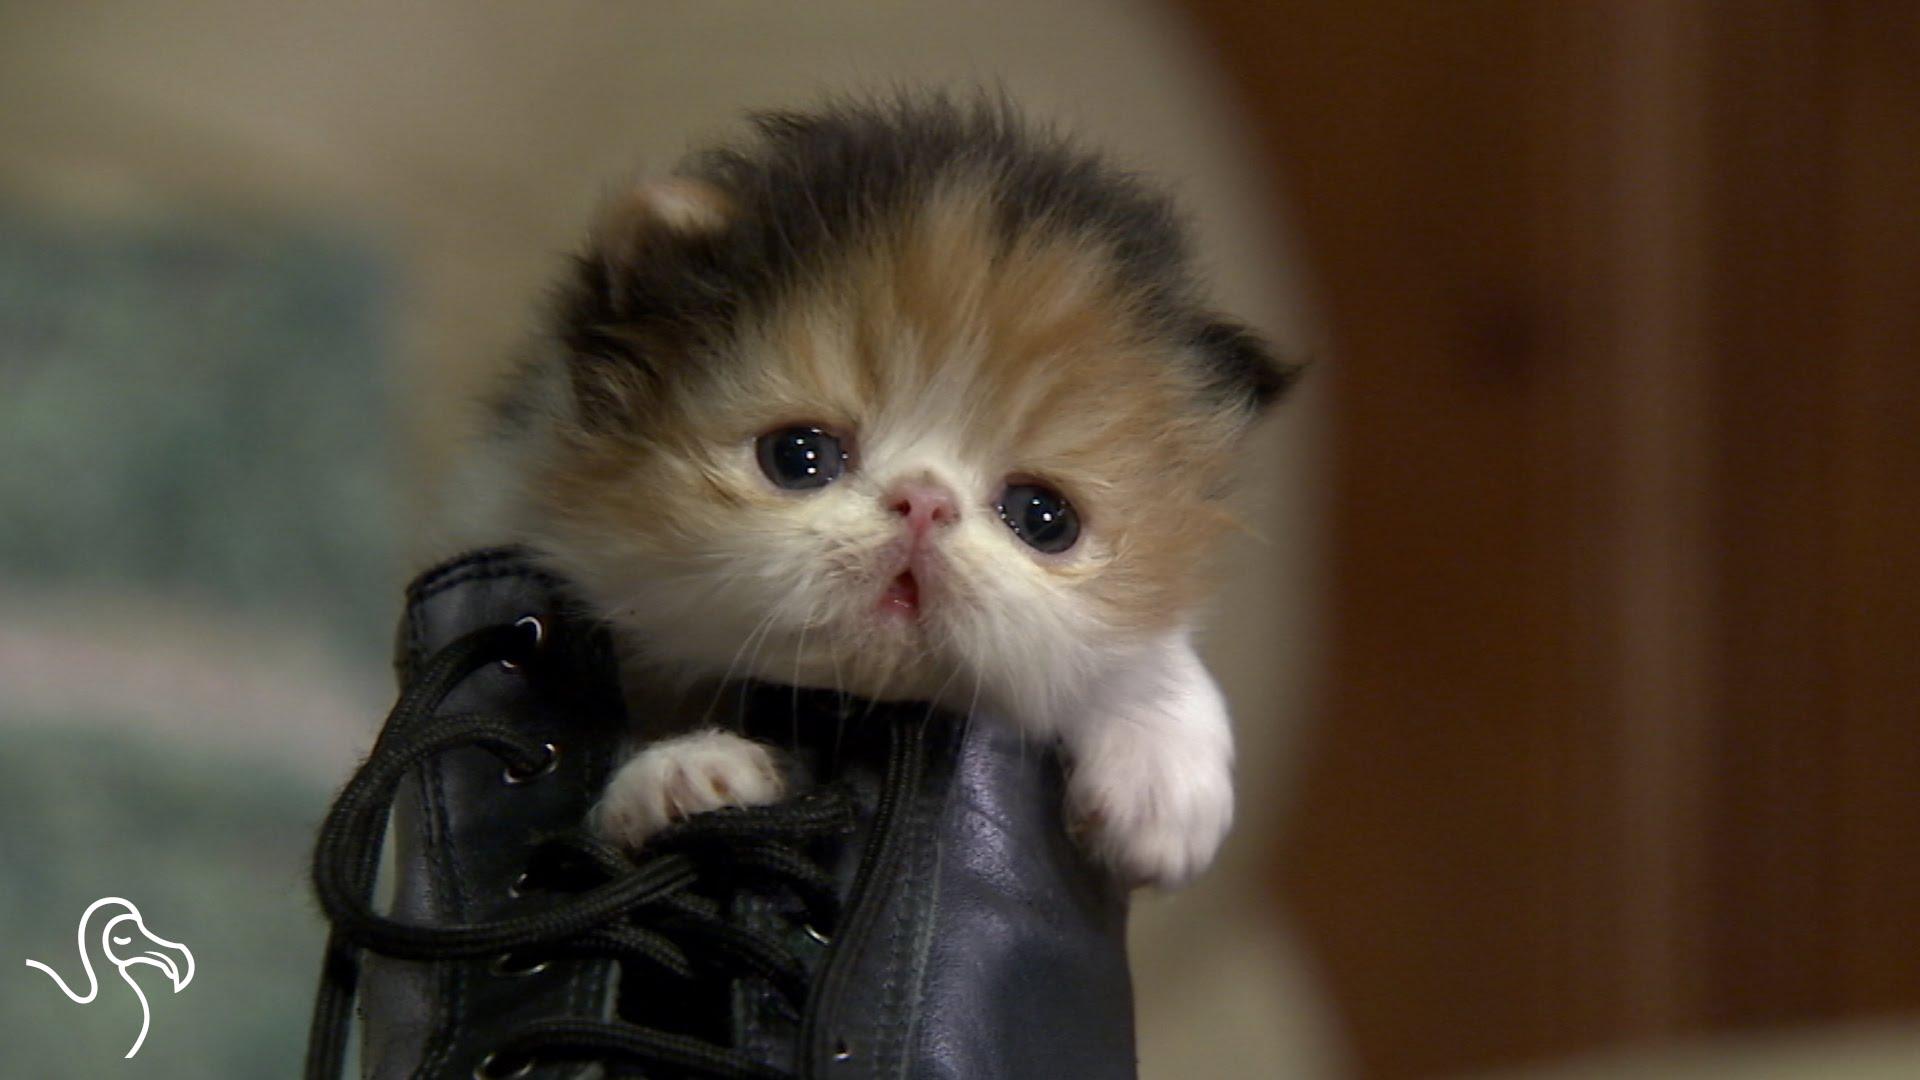 Tiny Kitten in a Shoe - YouTube